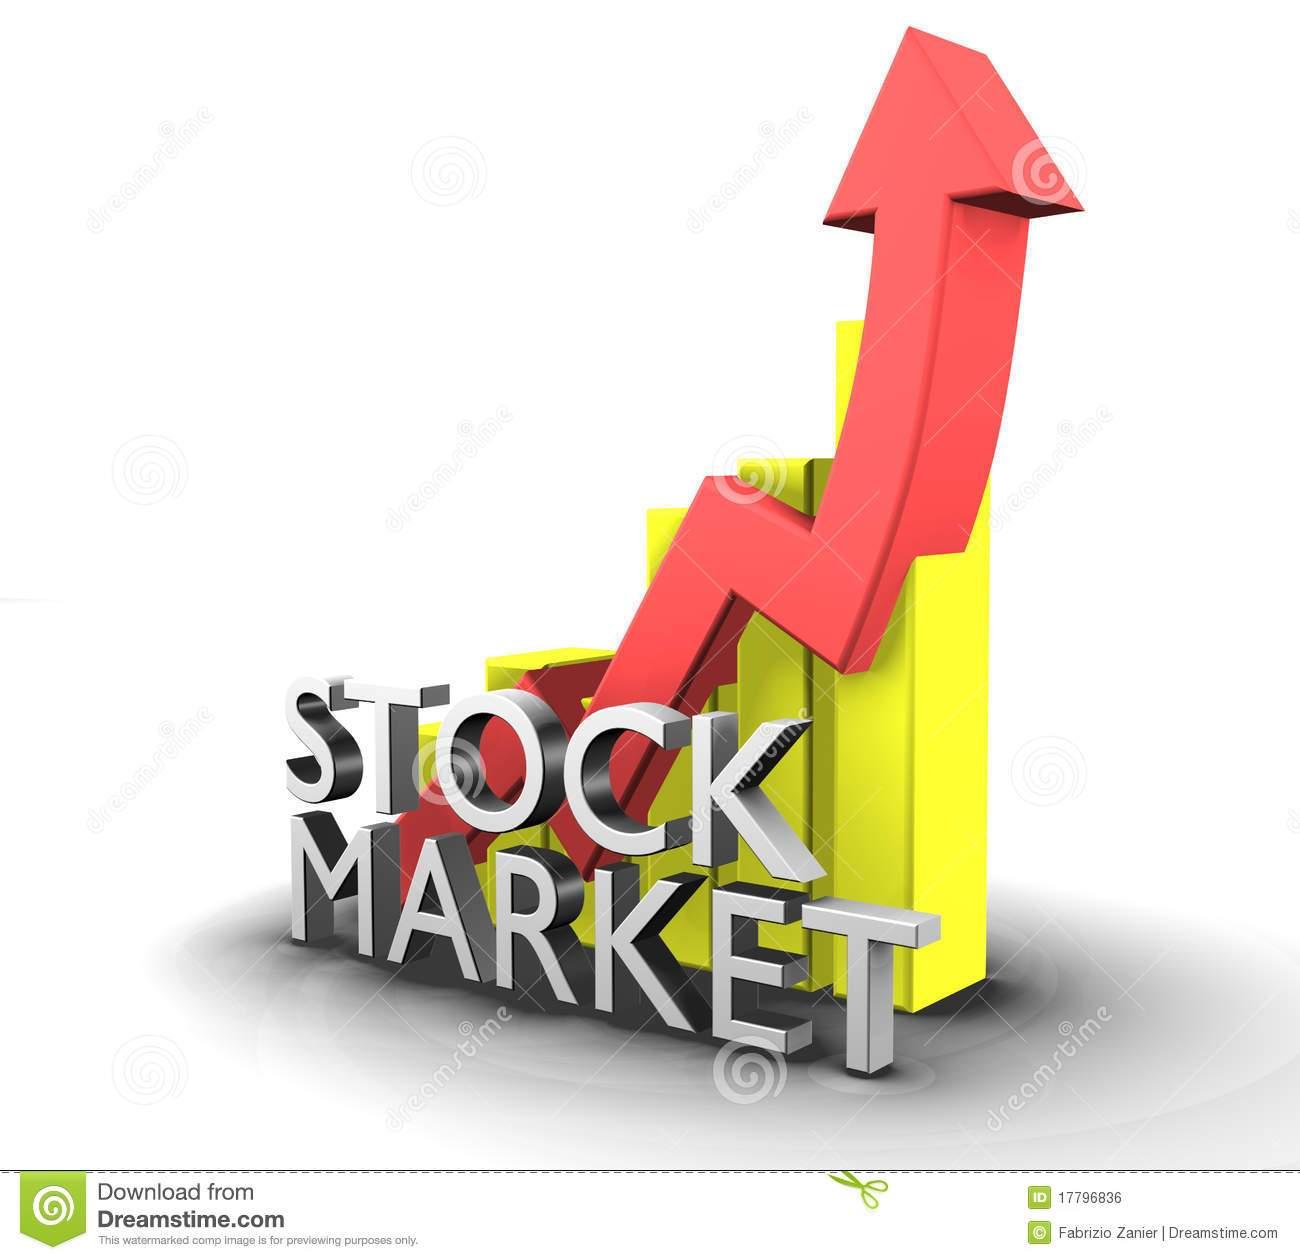 Stock market rise clipart 2 » Clipart Portal.